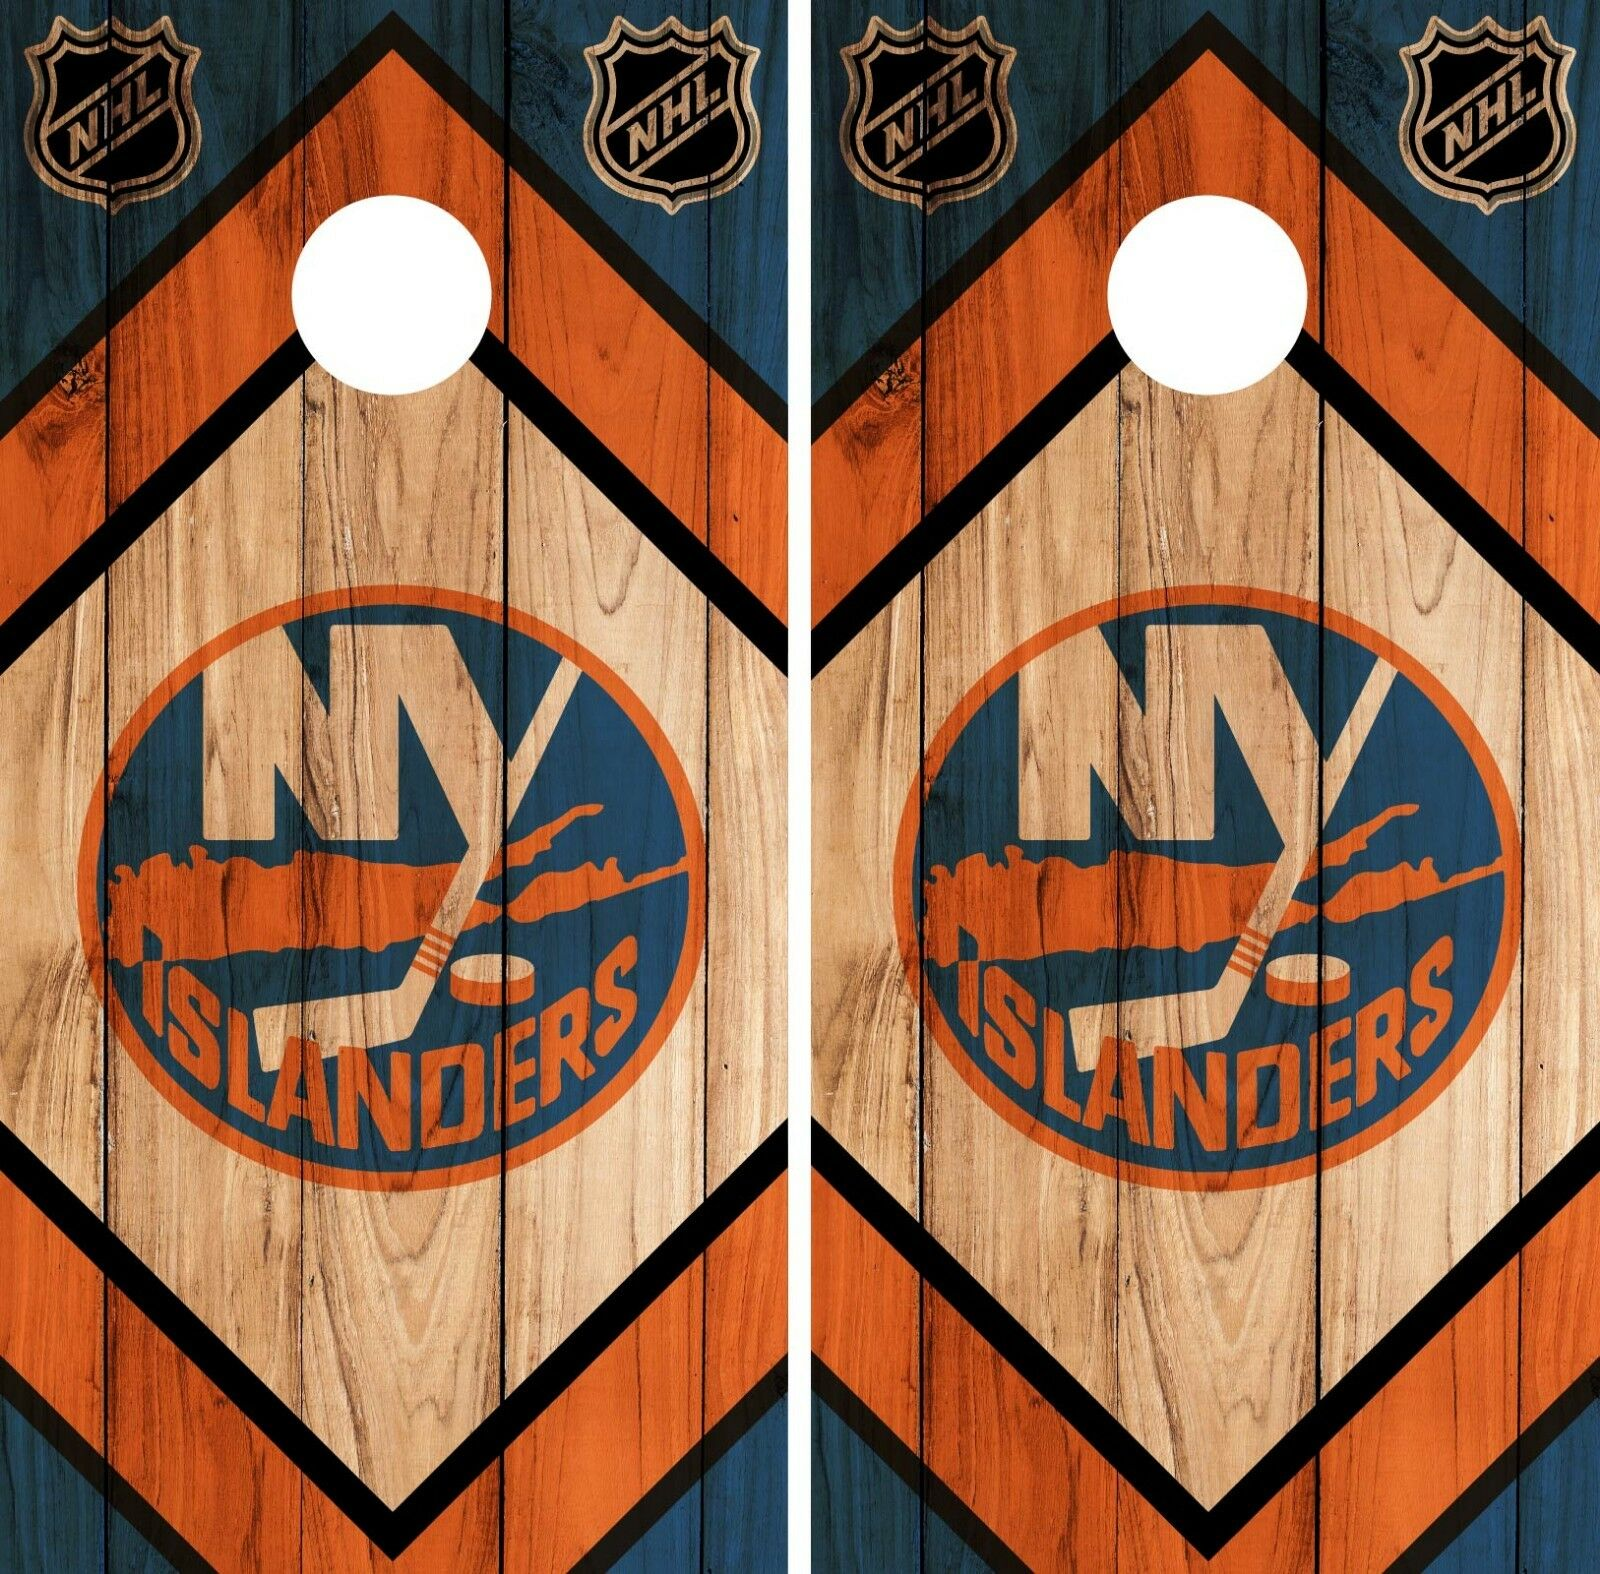 New York Islanders Cornhole Wrap NHL Wood Game Board Skin Set Vinyl Decal CO239